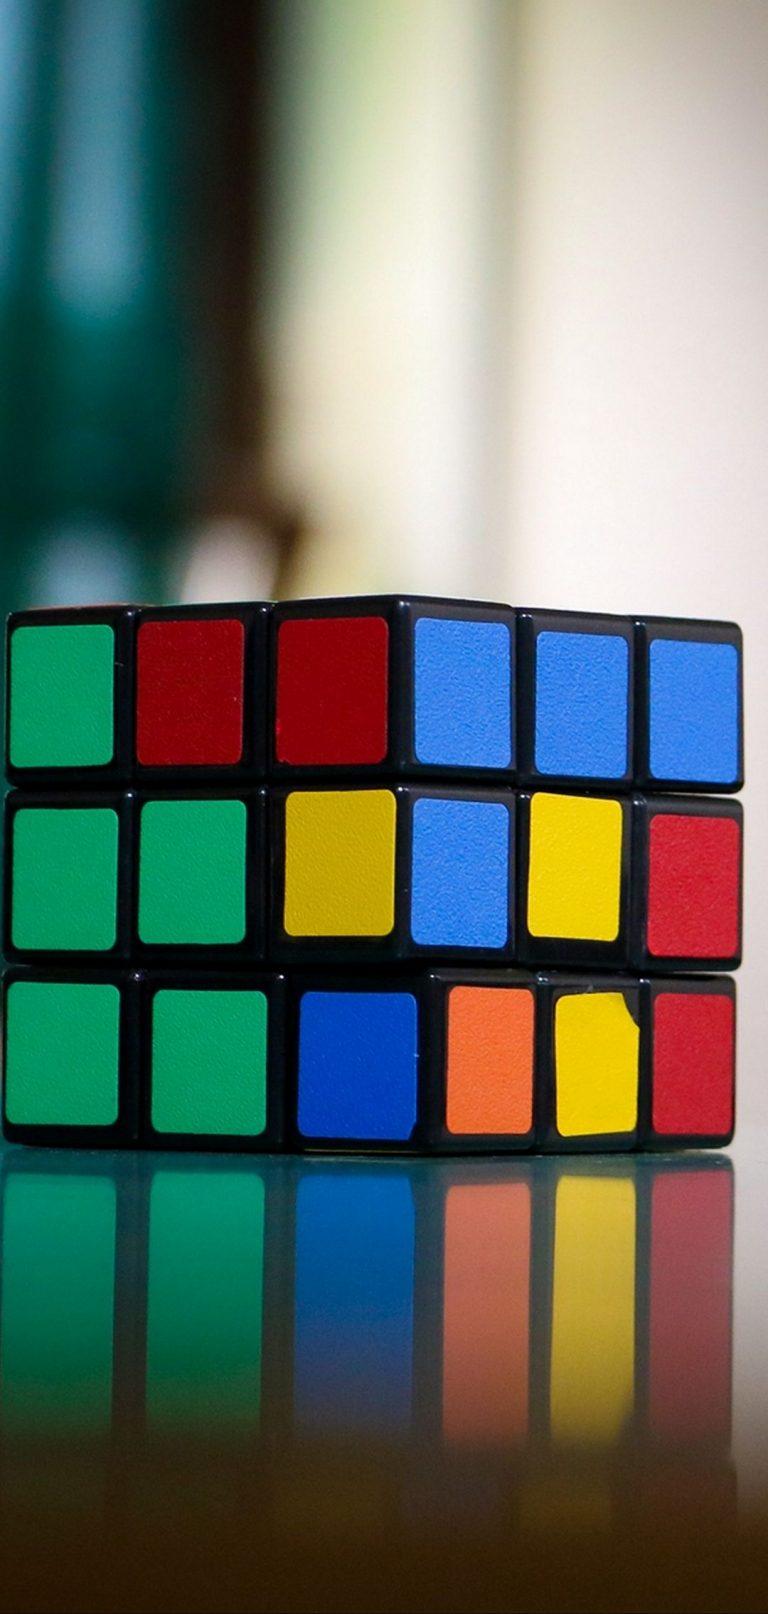 Rubiks Cube Puzzle Multi Colored 1080x2270 768x1614